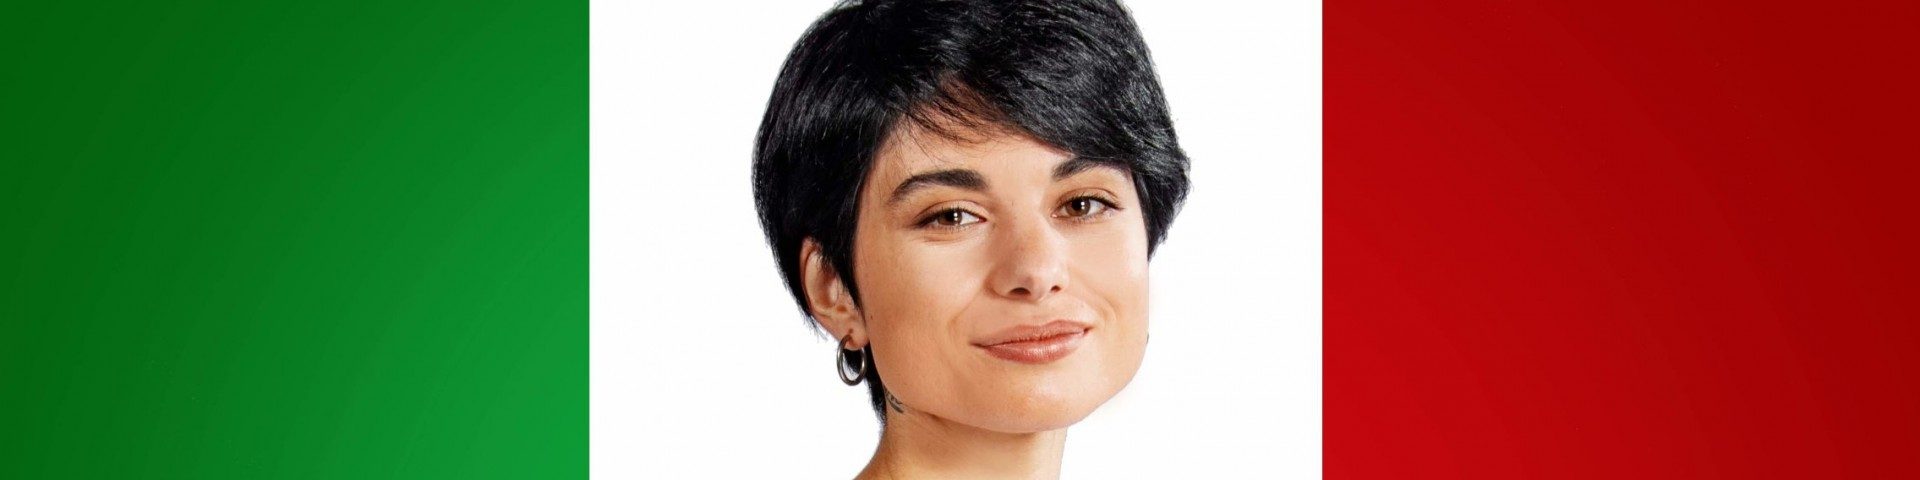 Giordana Angi: la sorella Elisa seguirà le sue orme? (Foto)